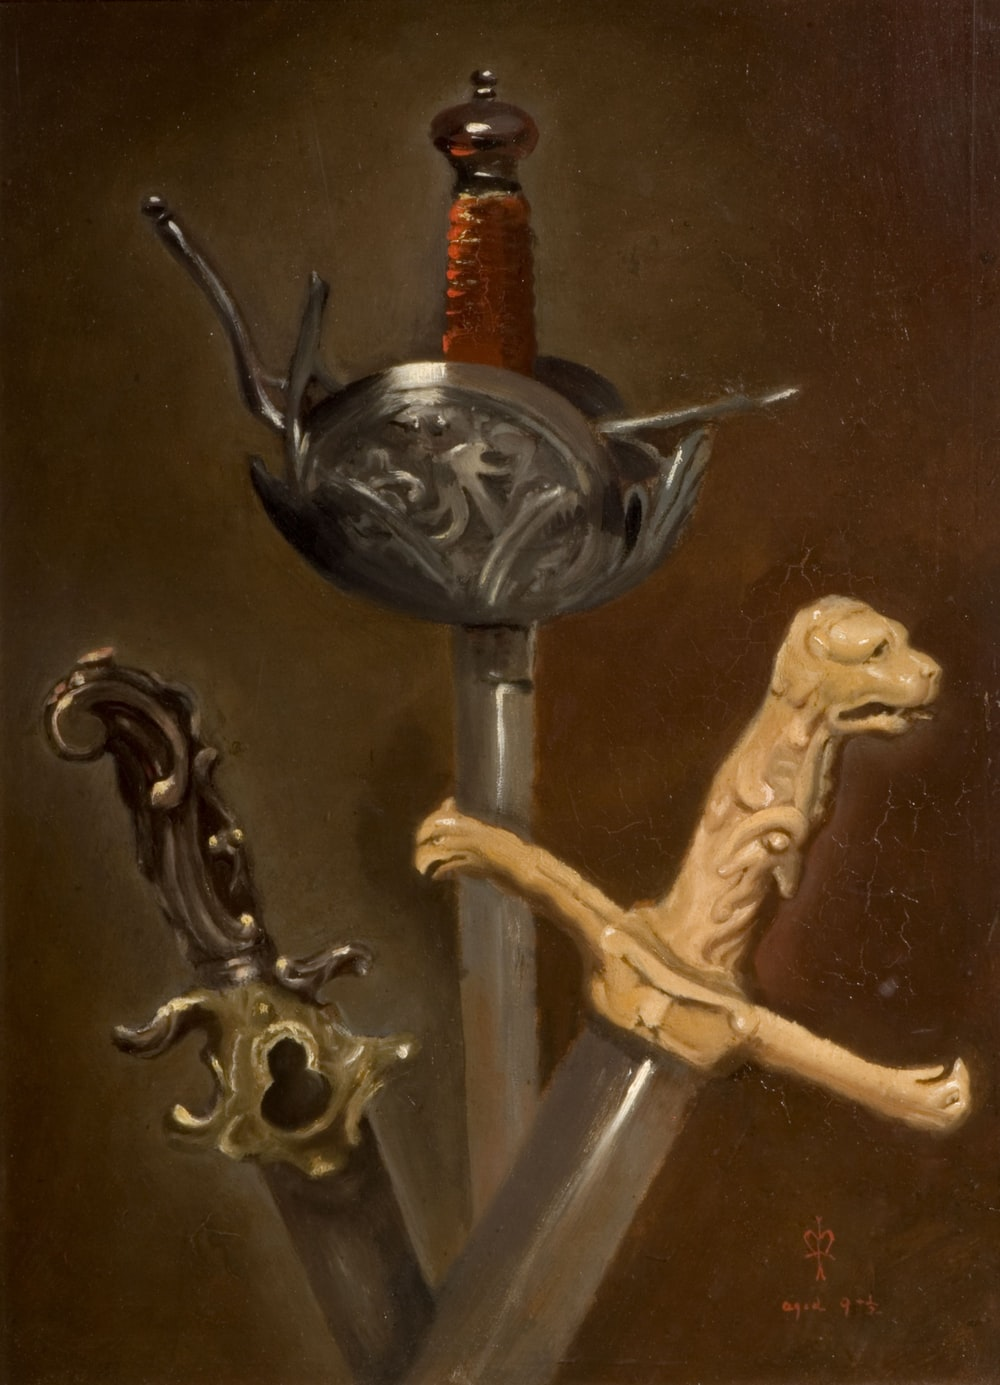 three assorted-color swords